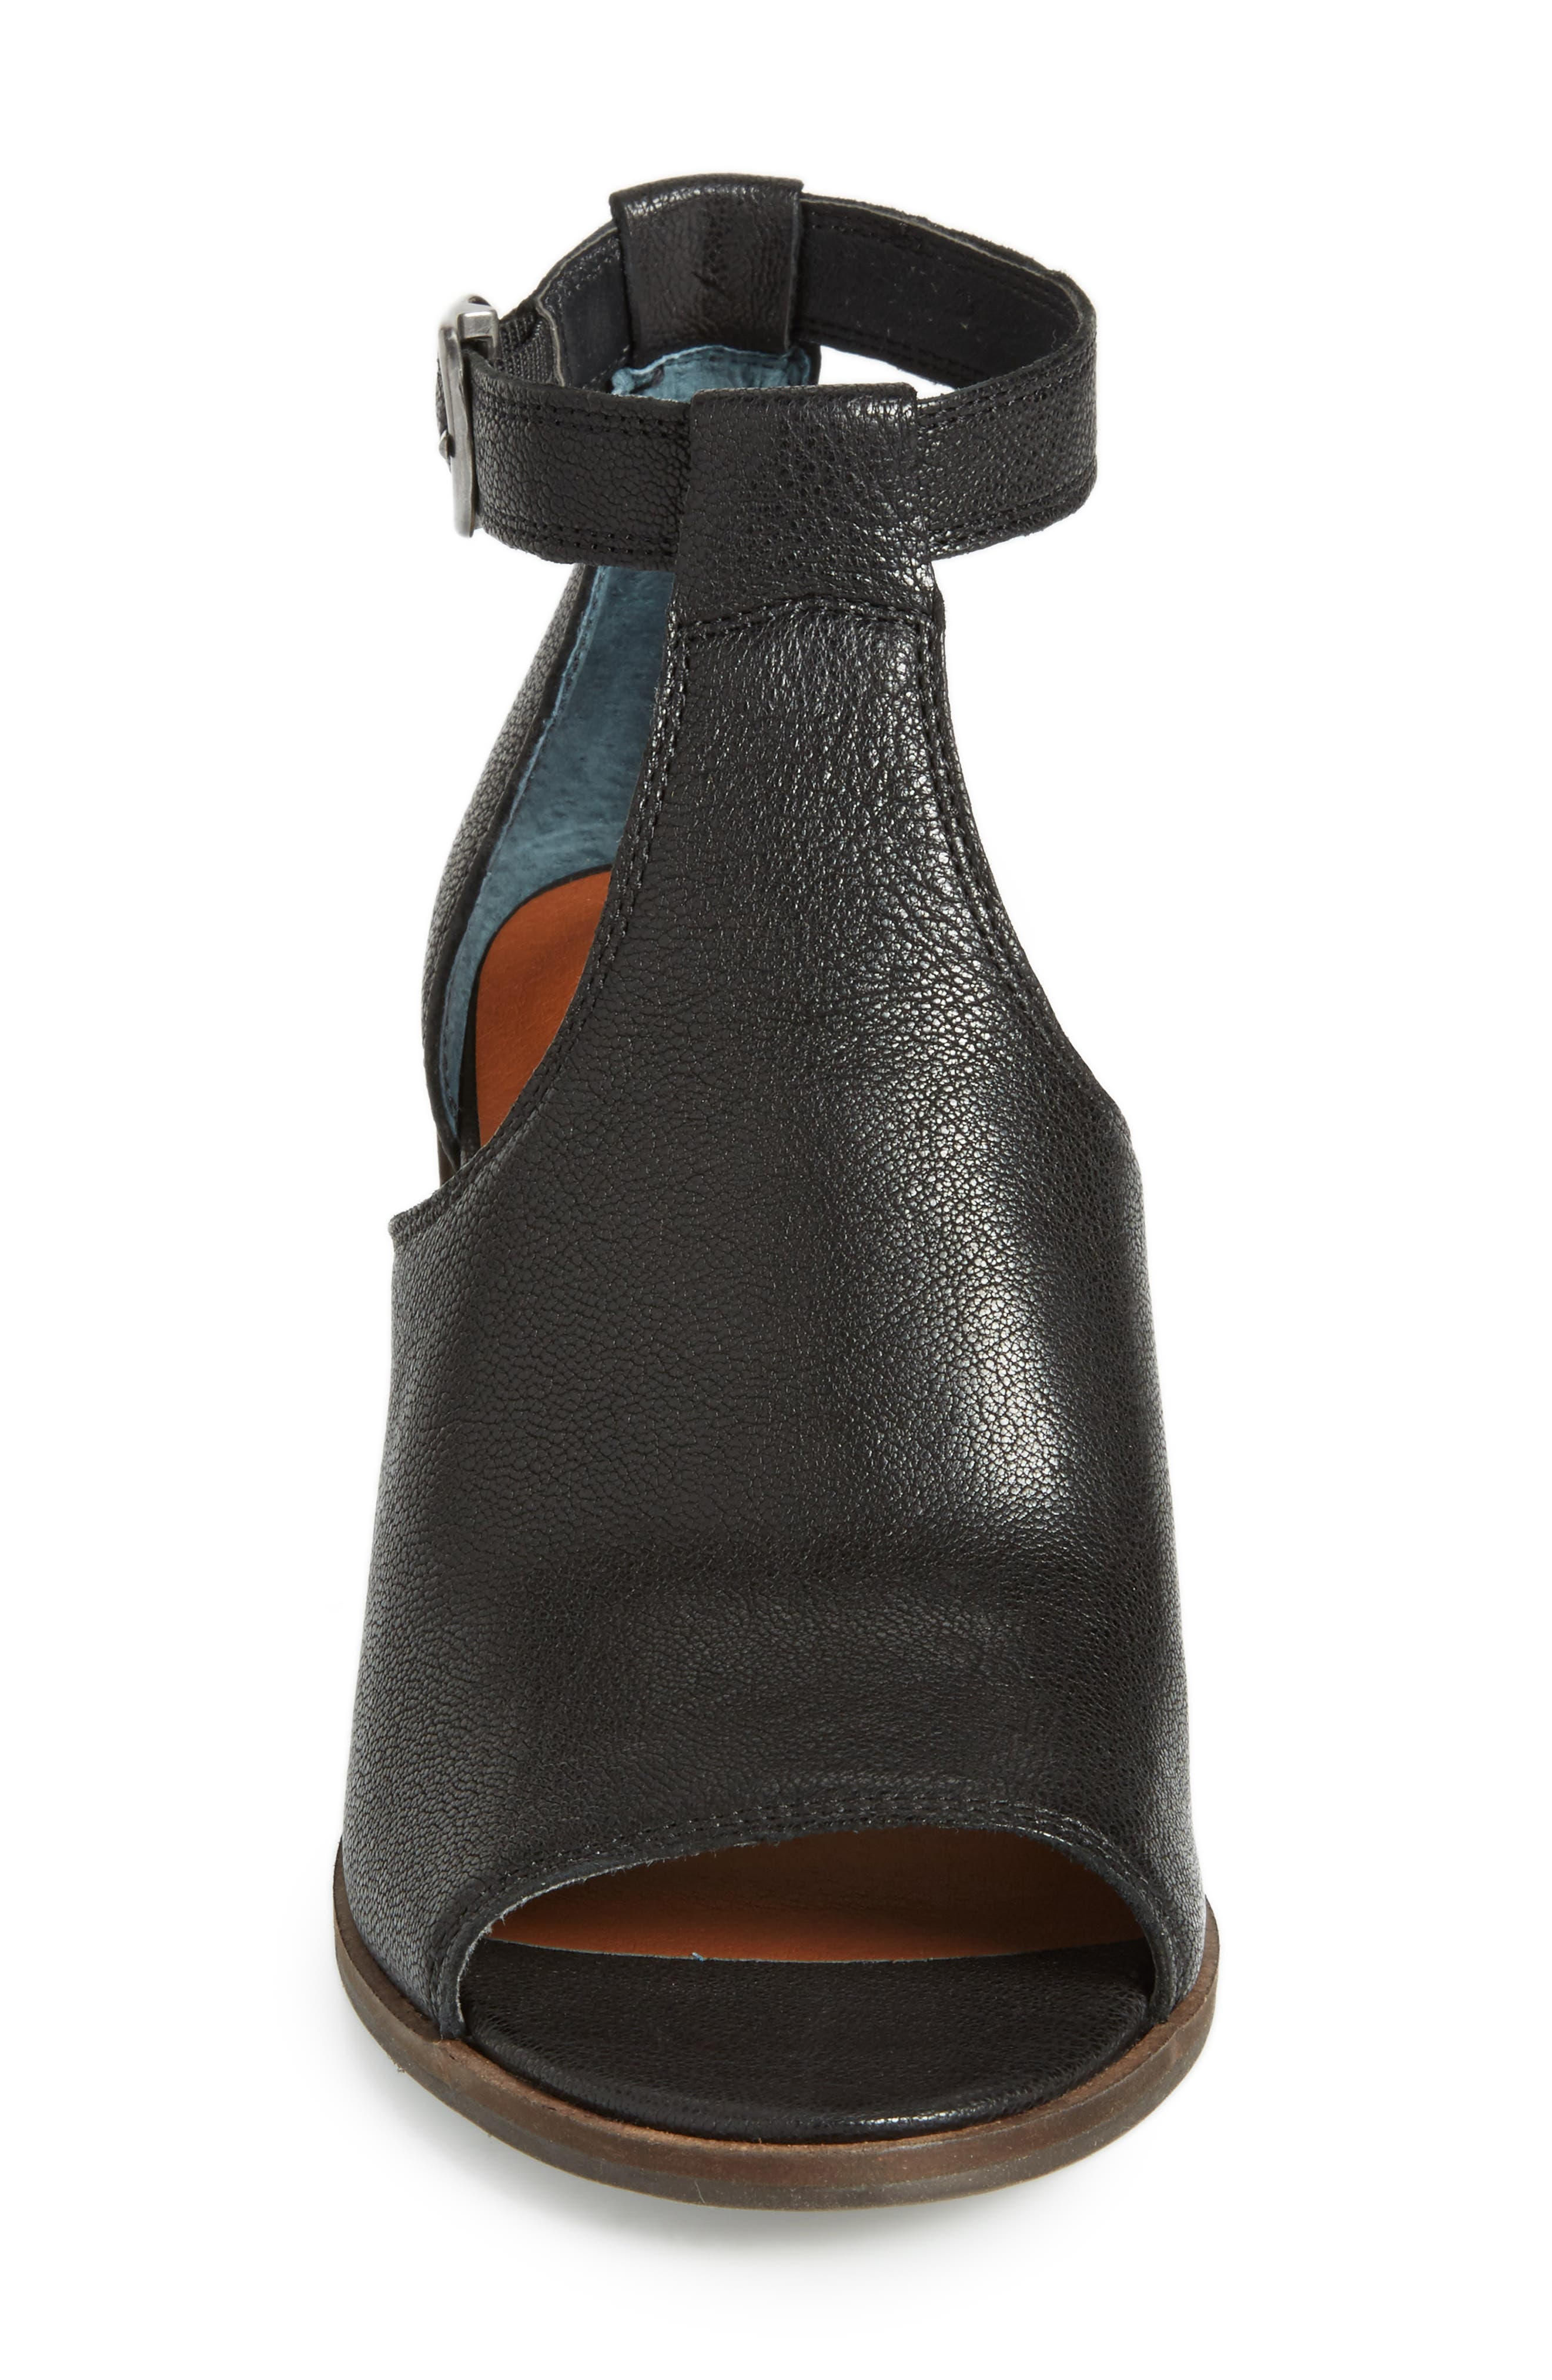 Kadian Block Heel Sandal,                             Alternate thumbnail 7, color,